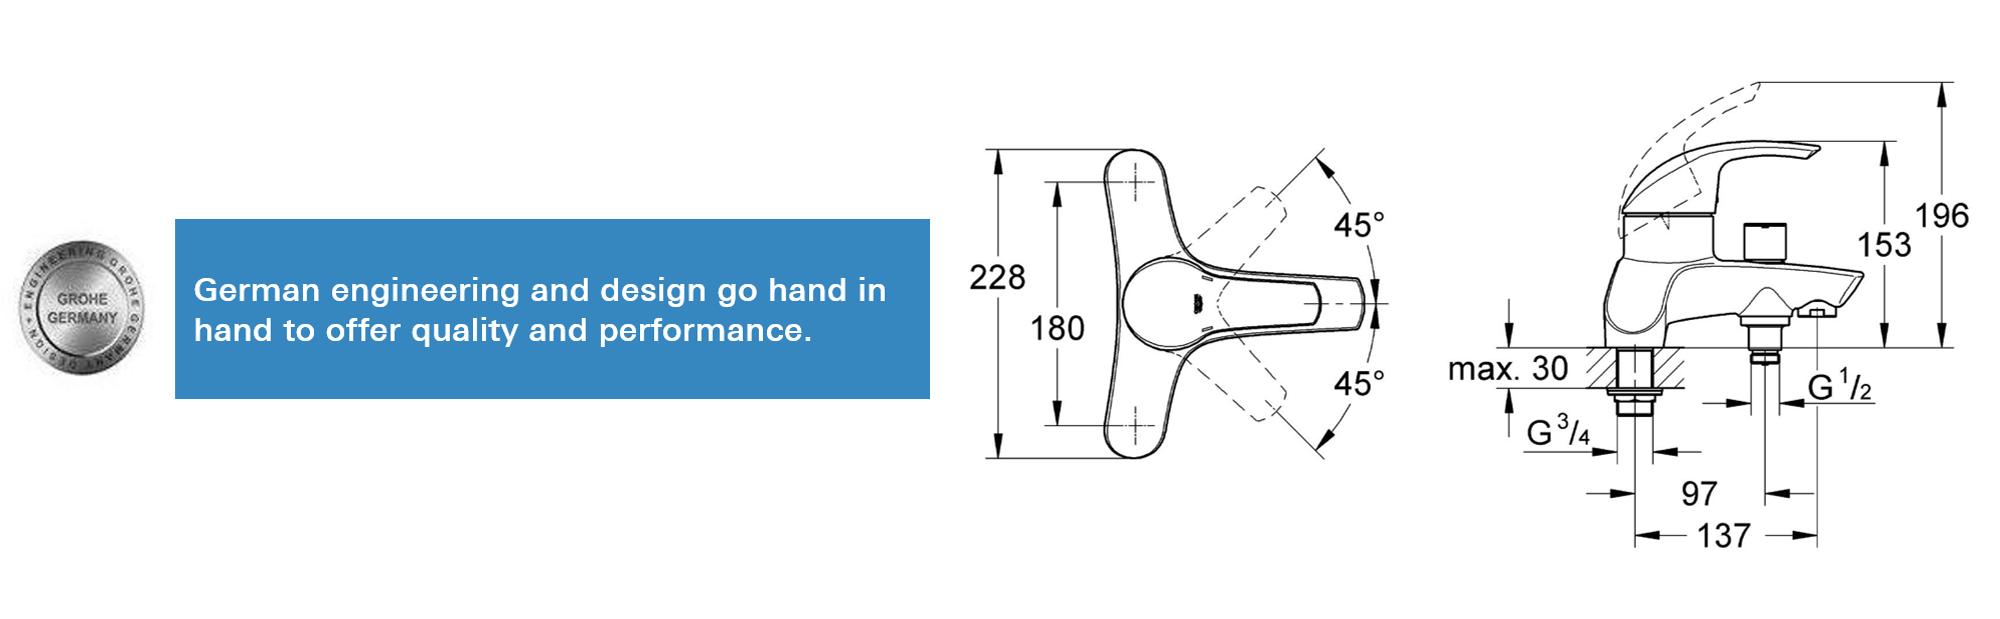 GROHE Eurosmart single-lever bath tap, bath and shower mixer, wall ...